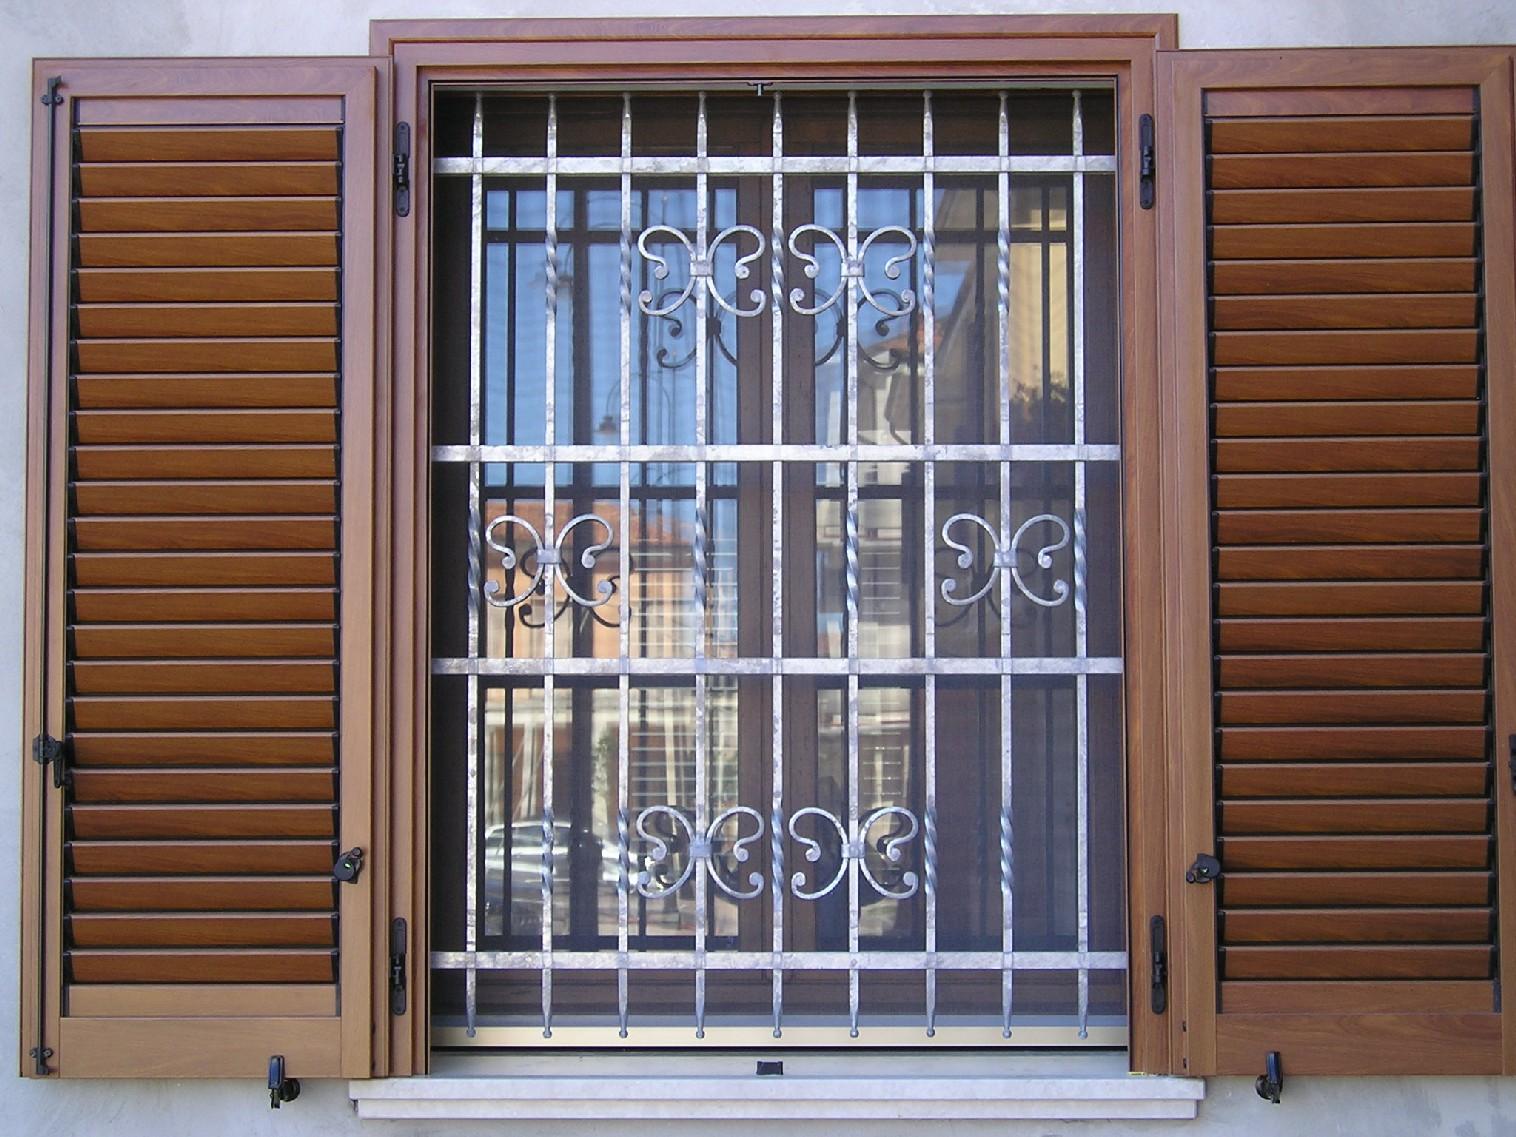 Metal service s r l - Modelli di grate per finestre ...